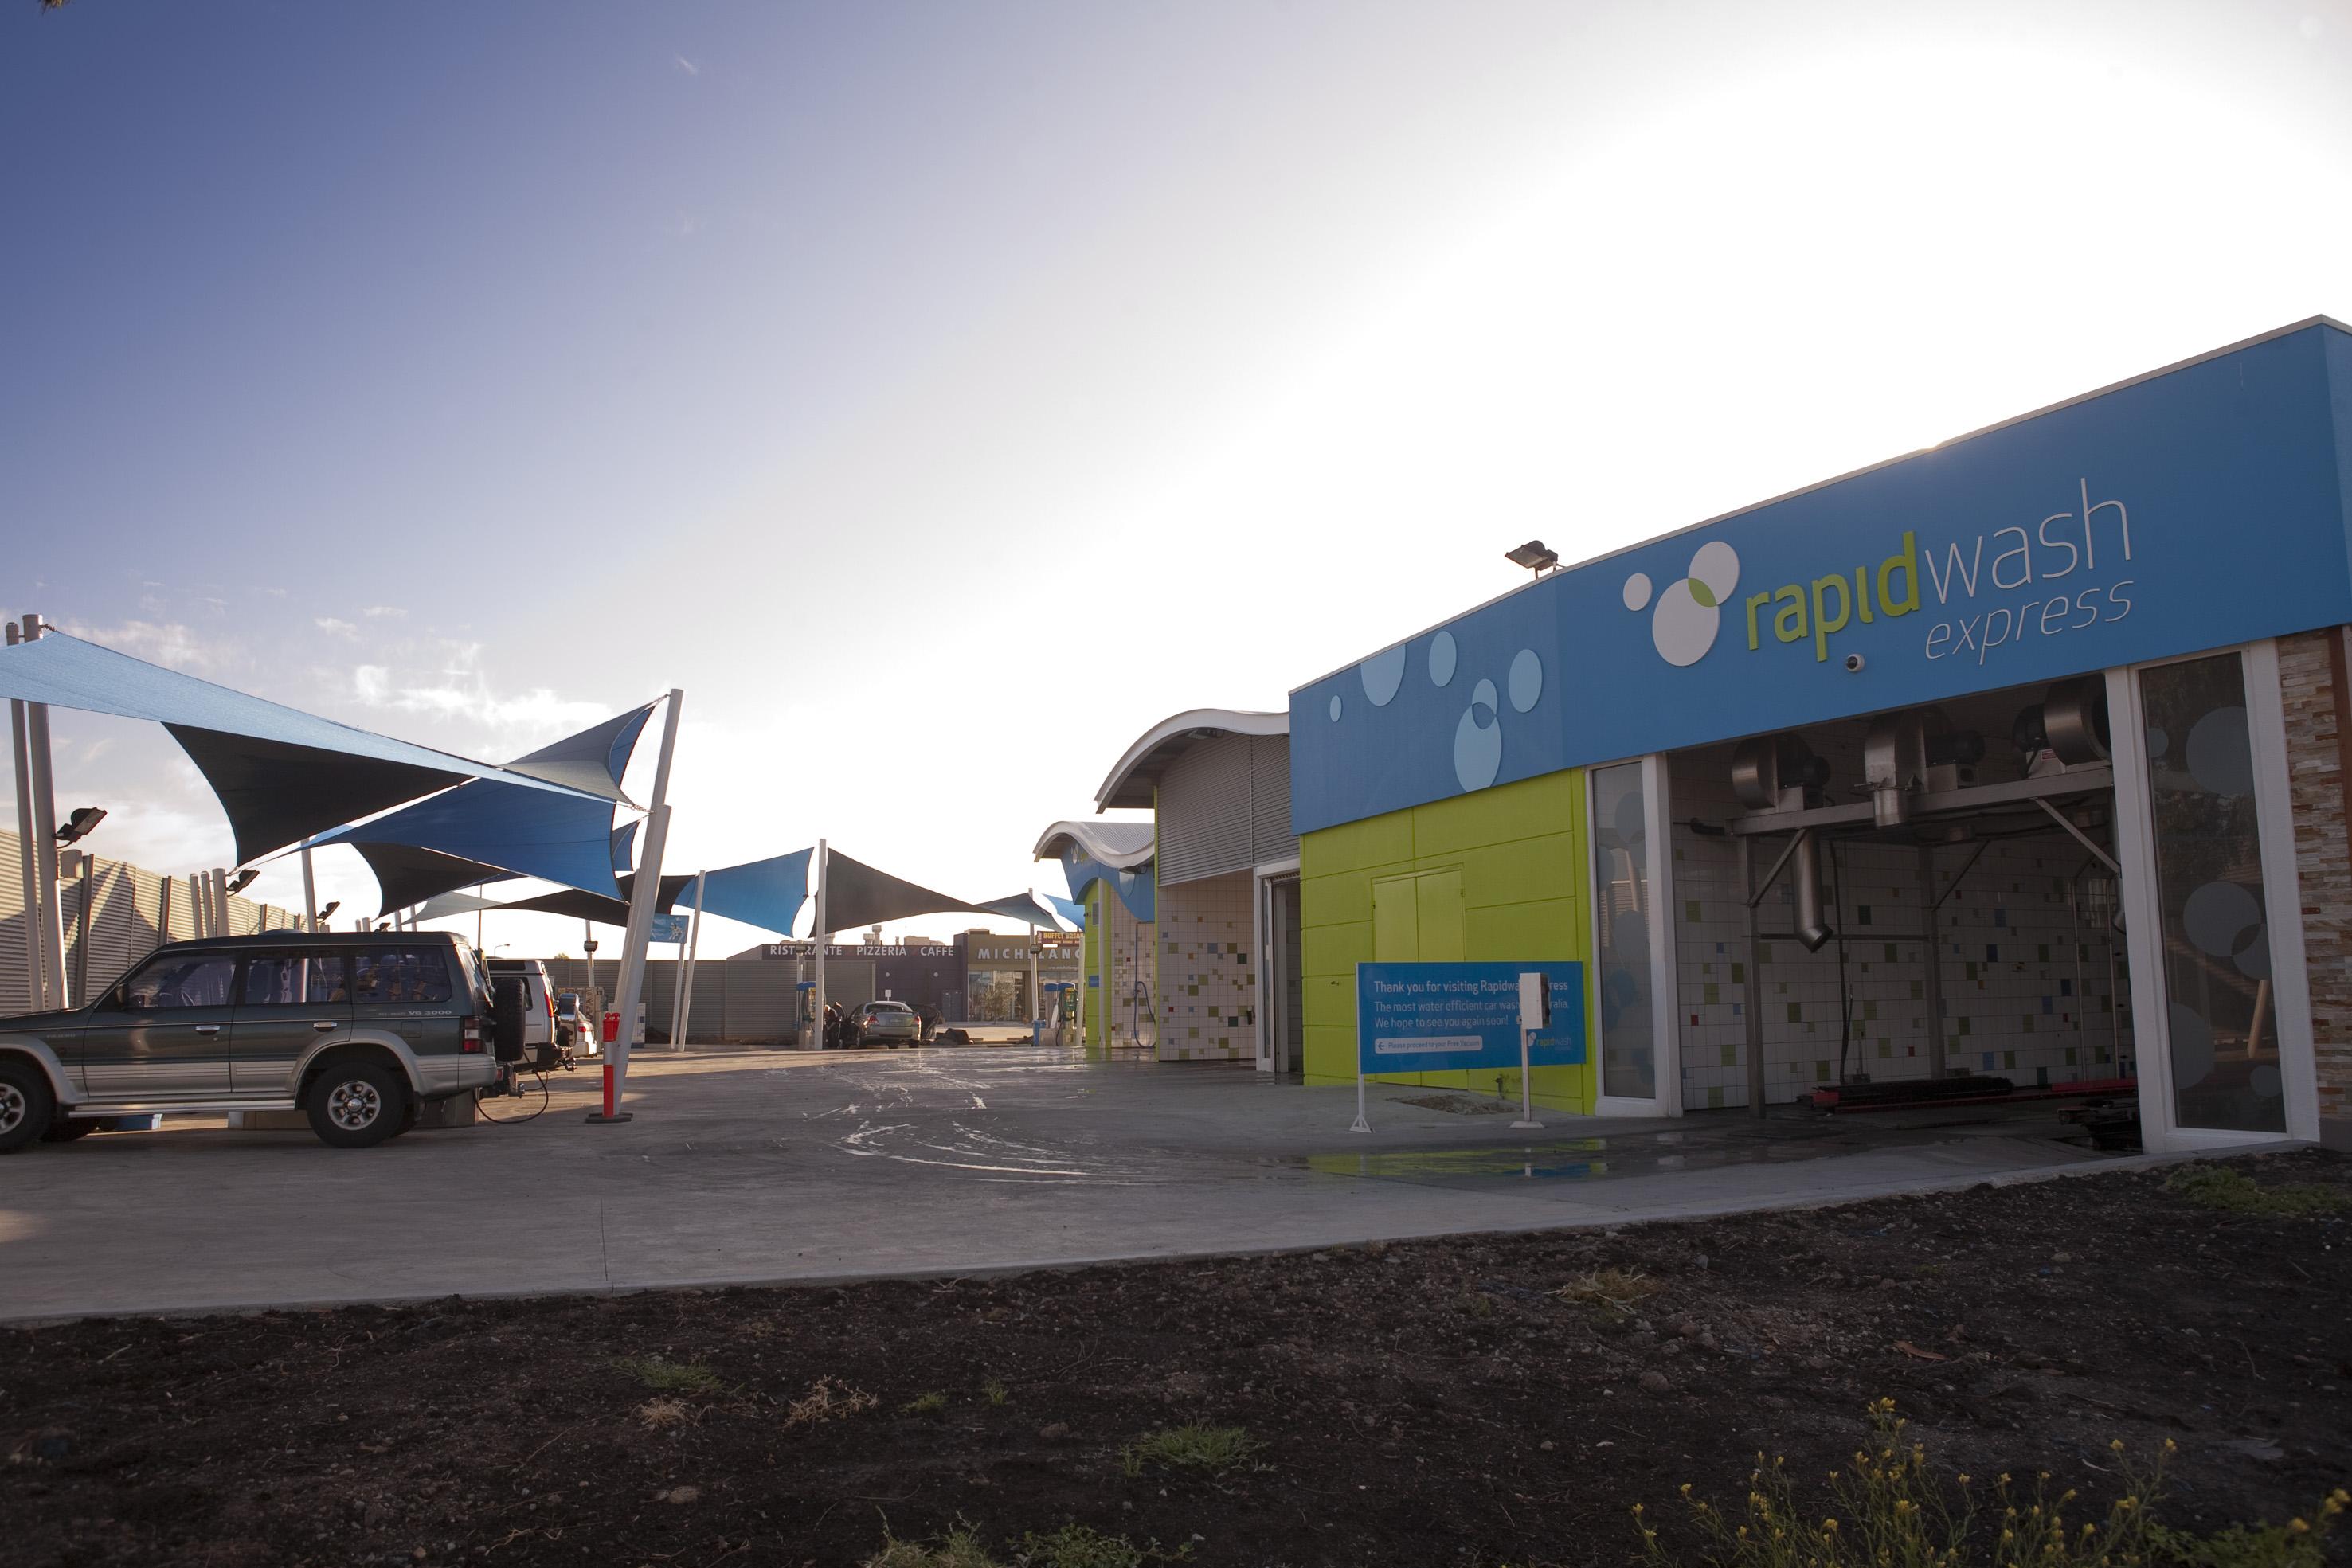 Car Dealers St George Utah >> Car Wash Locations Photos – Coleman Hanna Carwash Systems